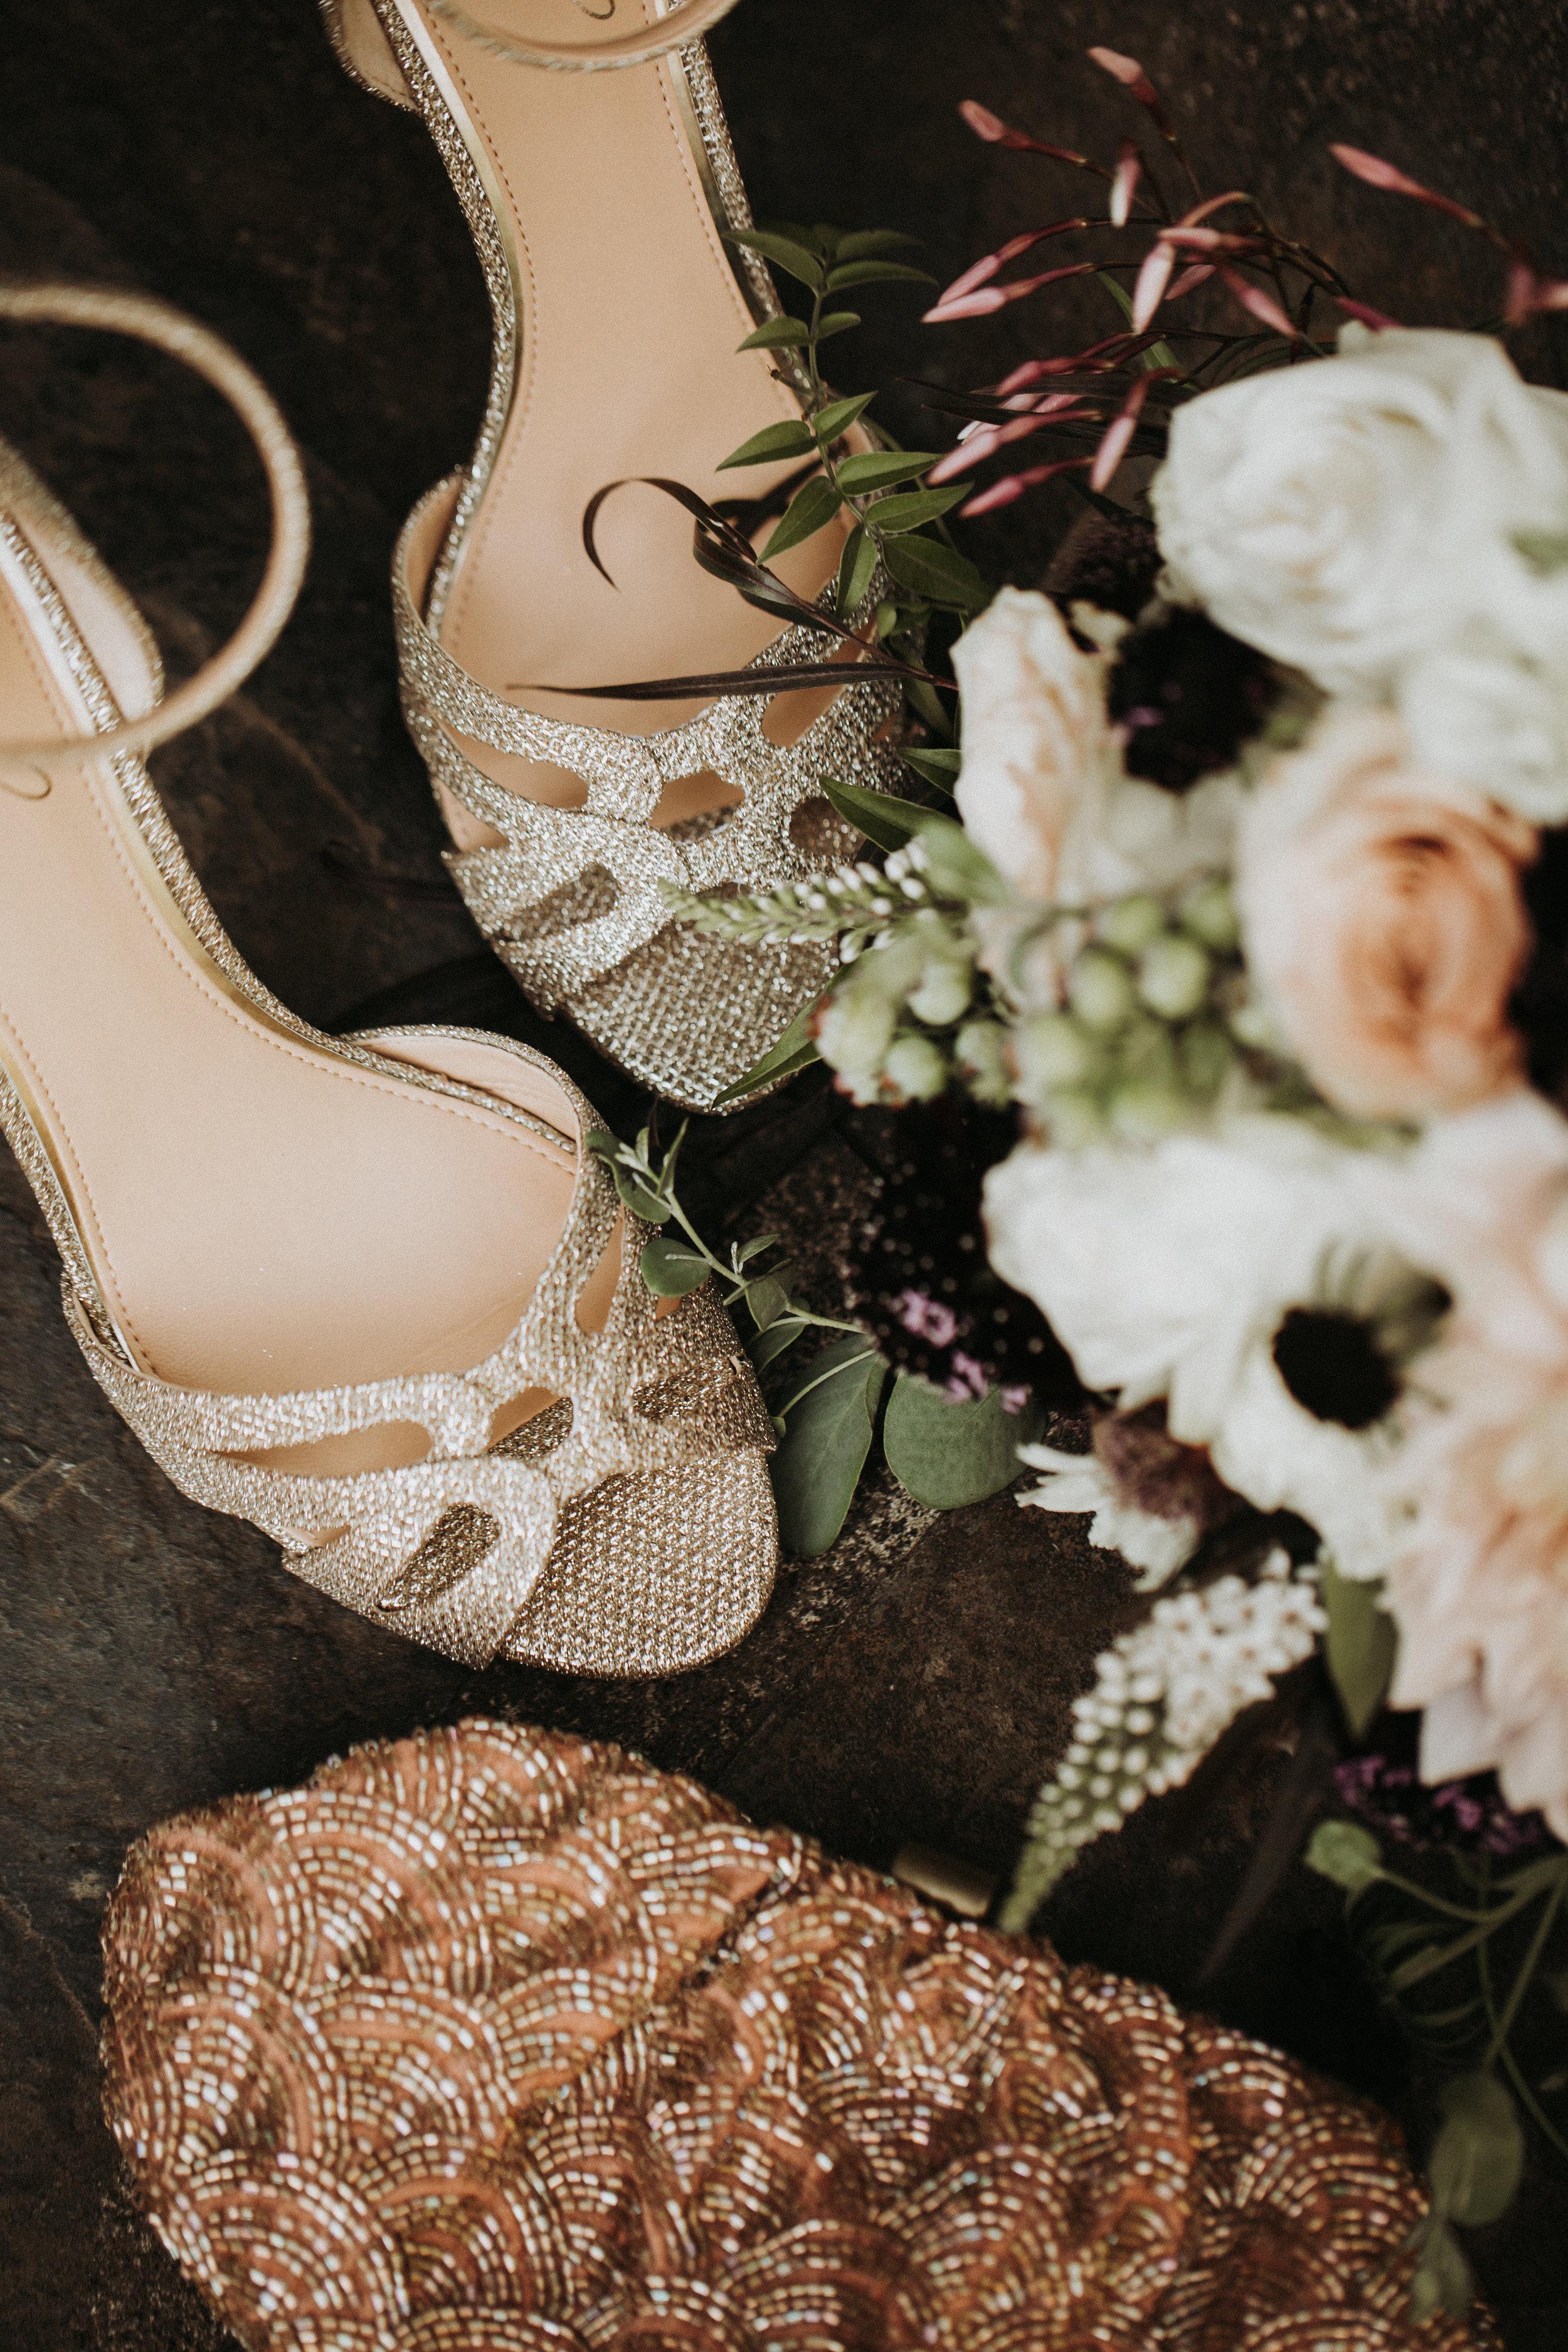 PORTLAND INTIMATE BACKYARD WEDDING_JENNY CHOKBENGBOUN PHOTO-17.JPG